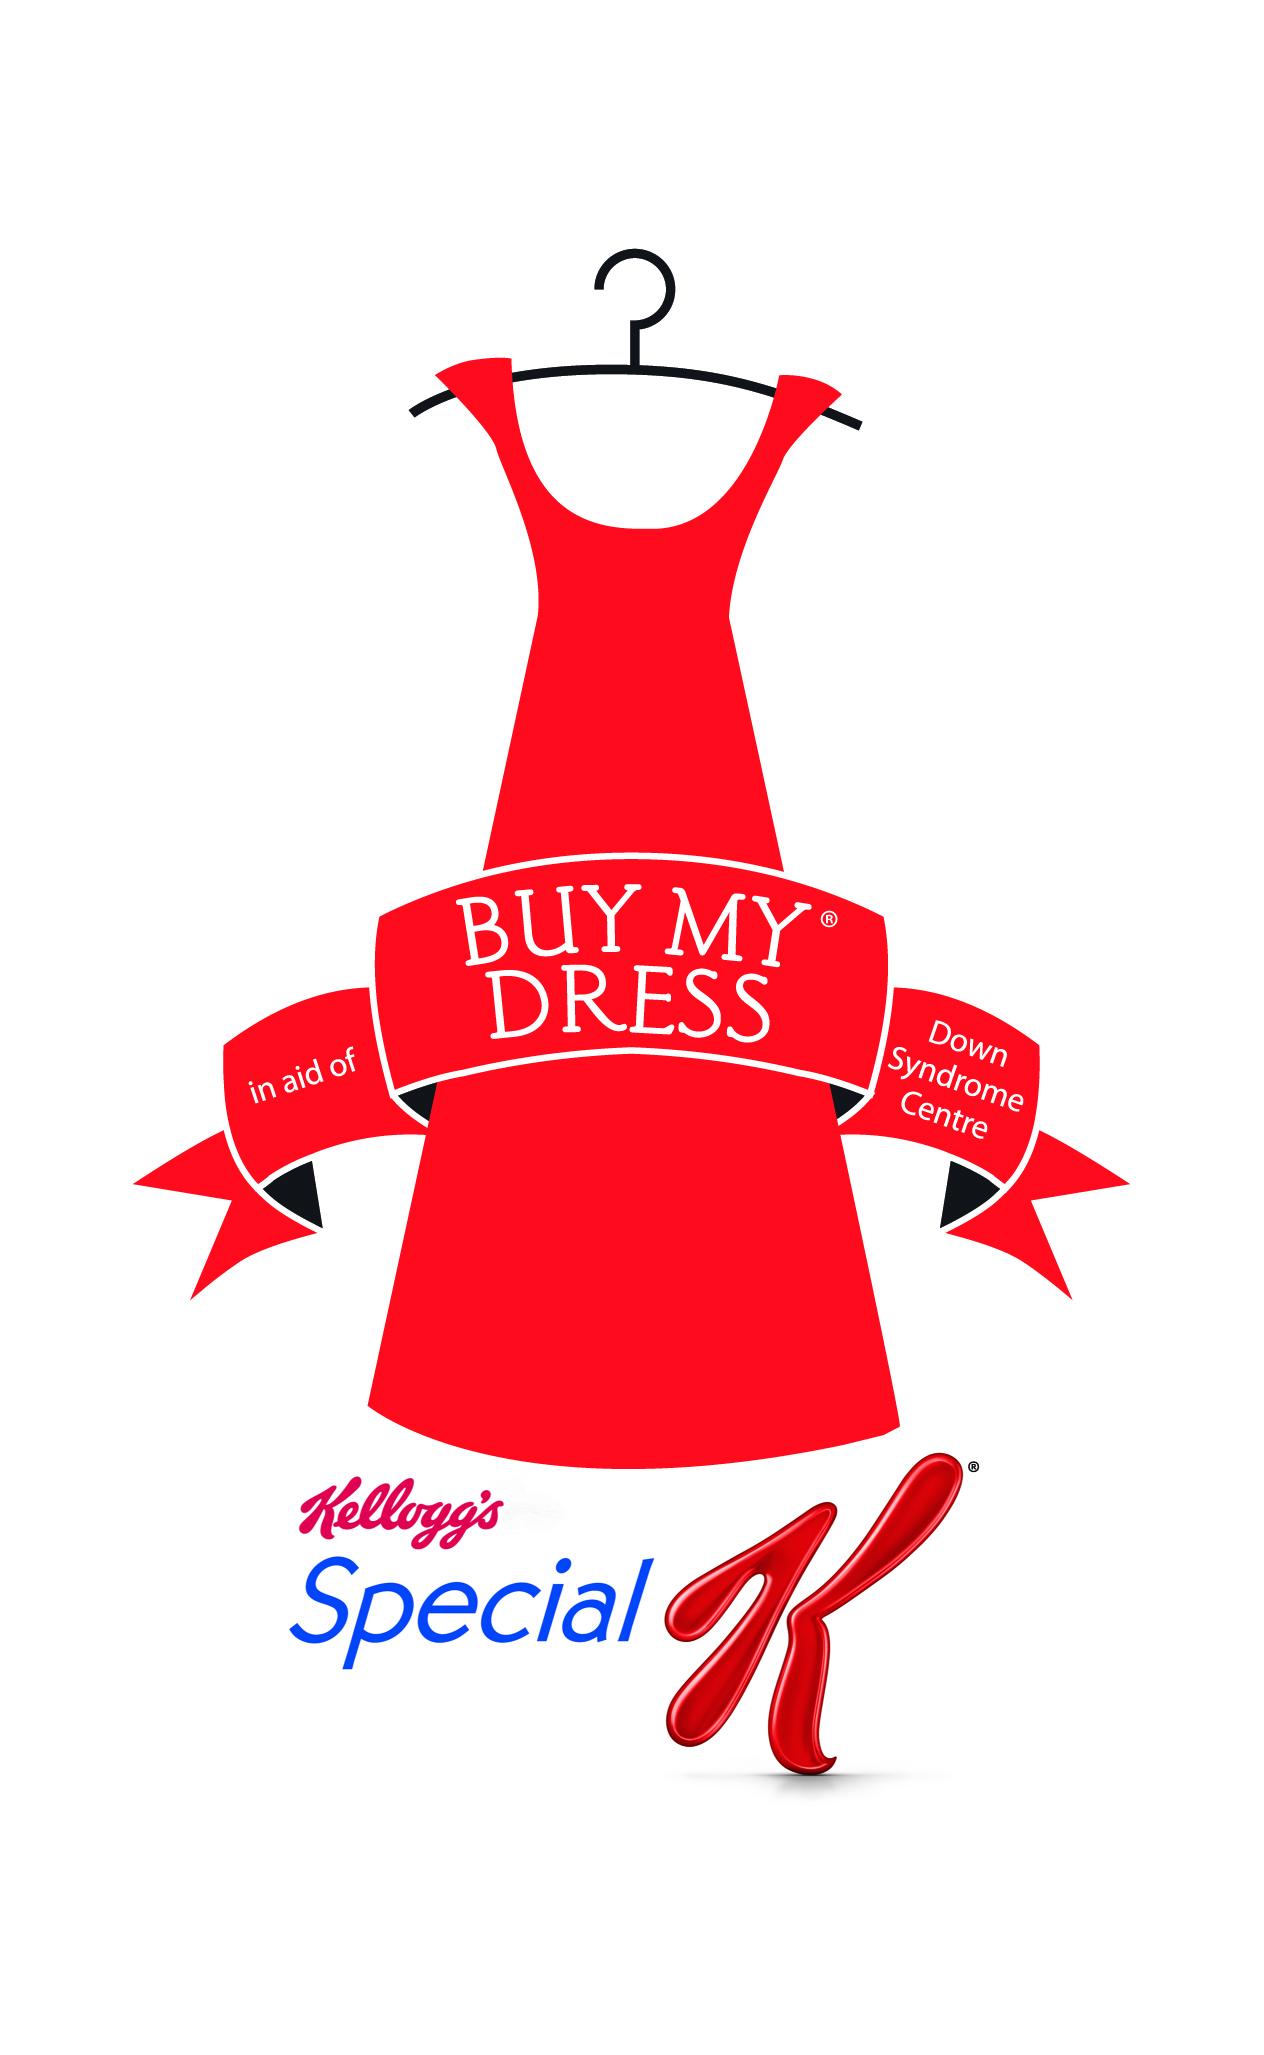 Kellogg's - Special K Buy My Dress